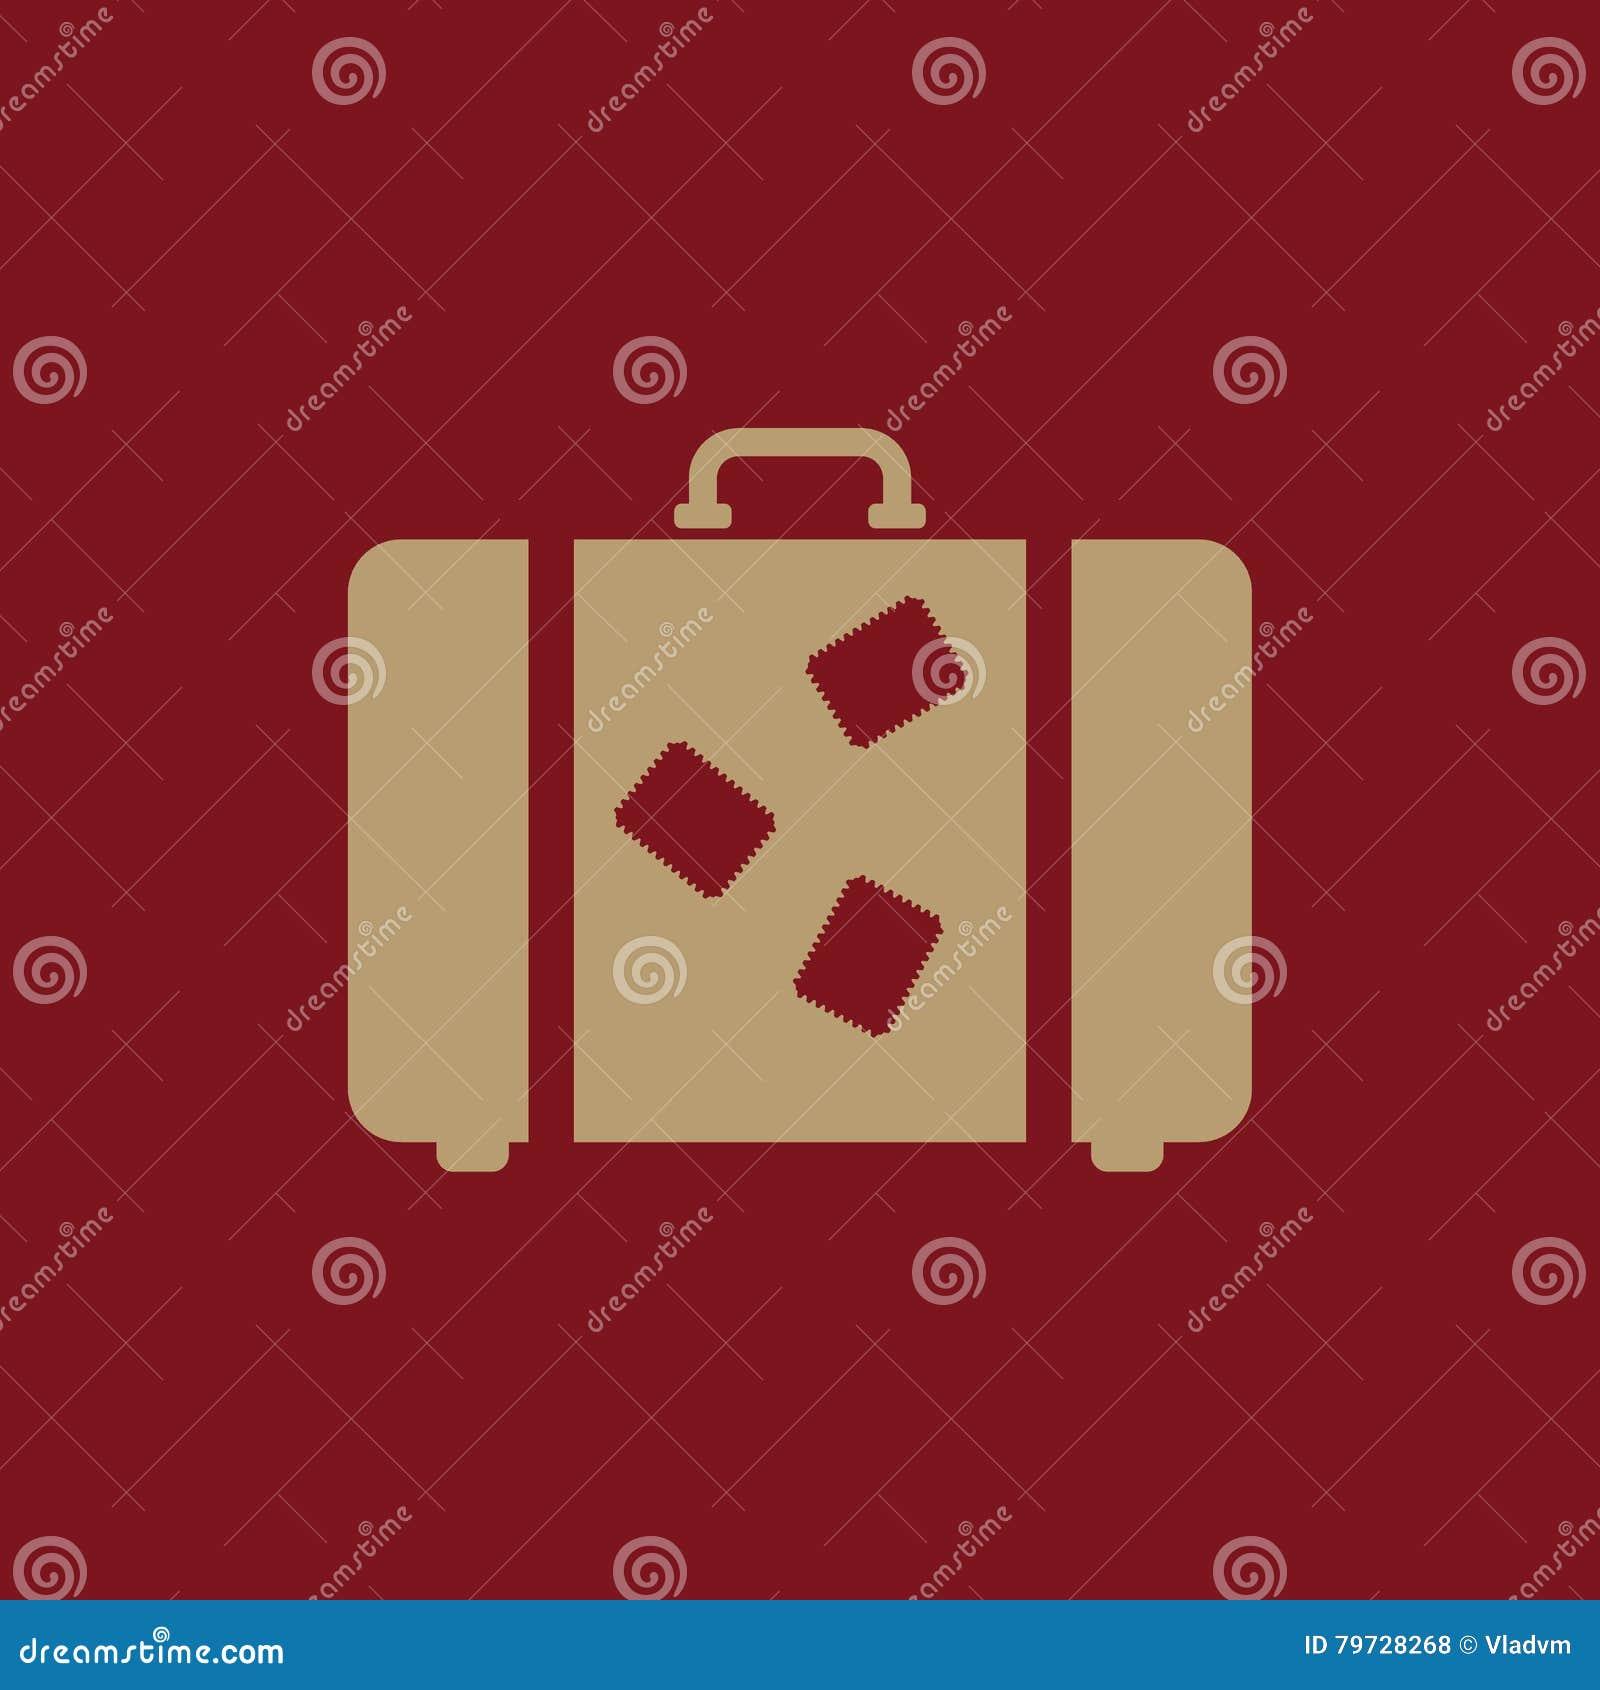 El icono de la maleta Símbolo del equipaje plano